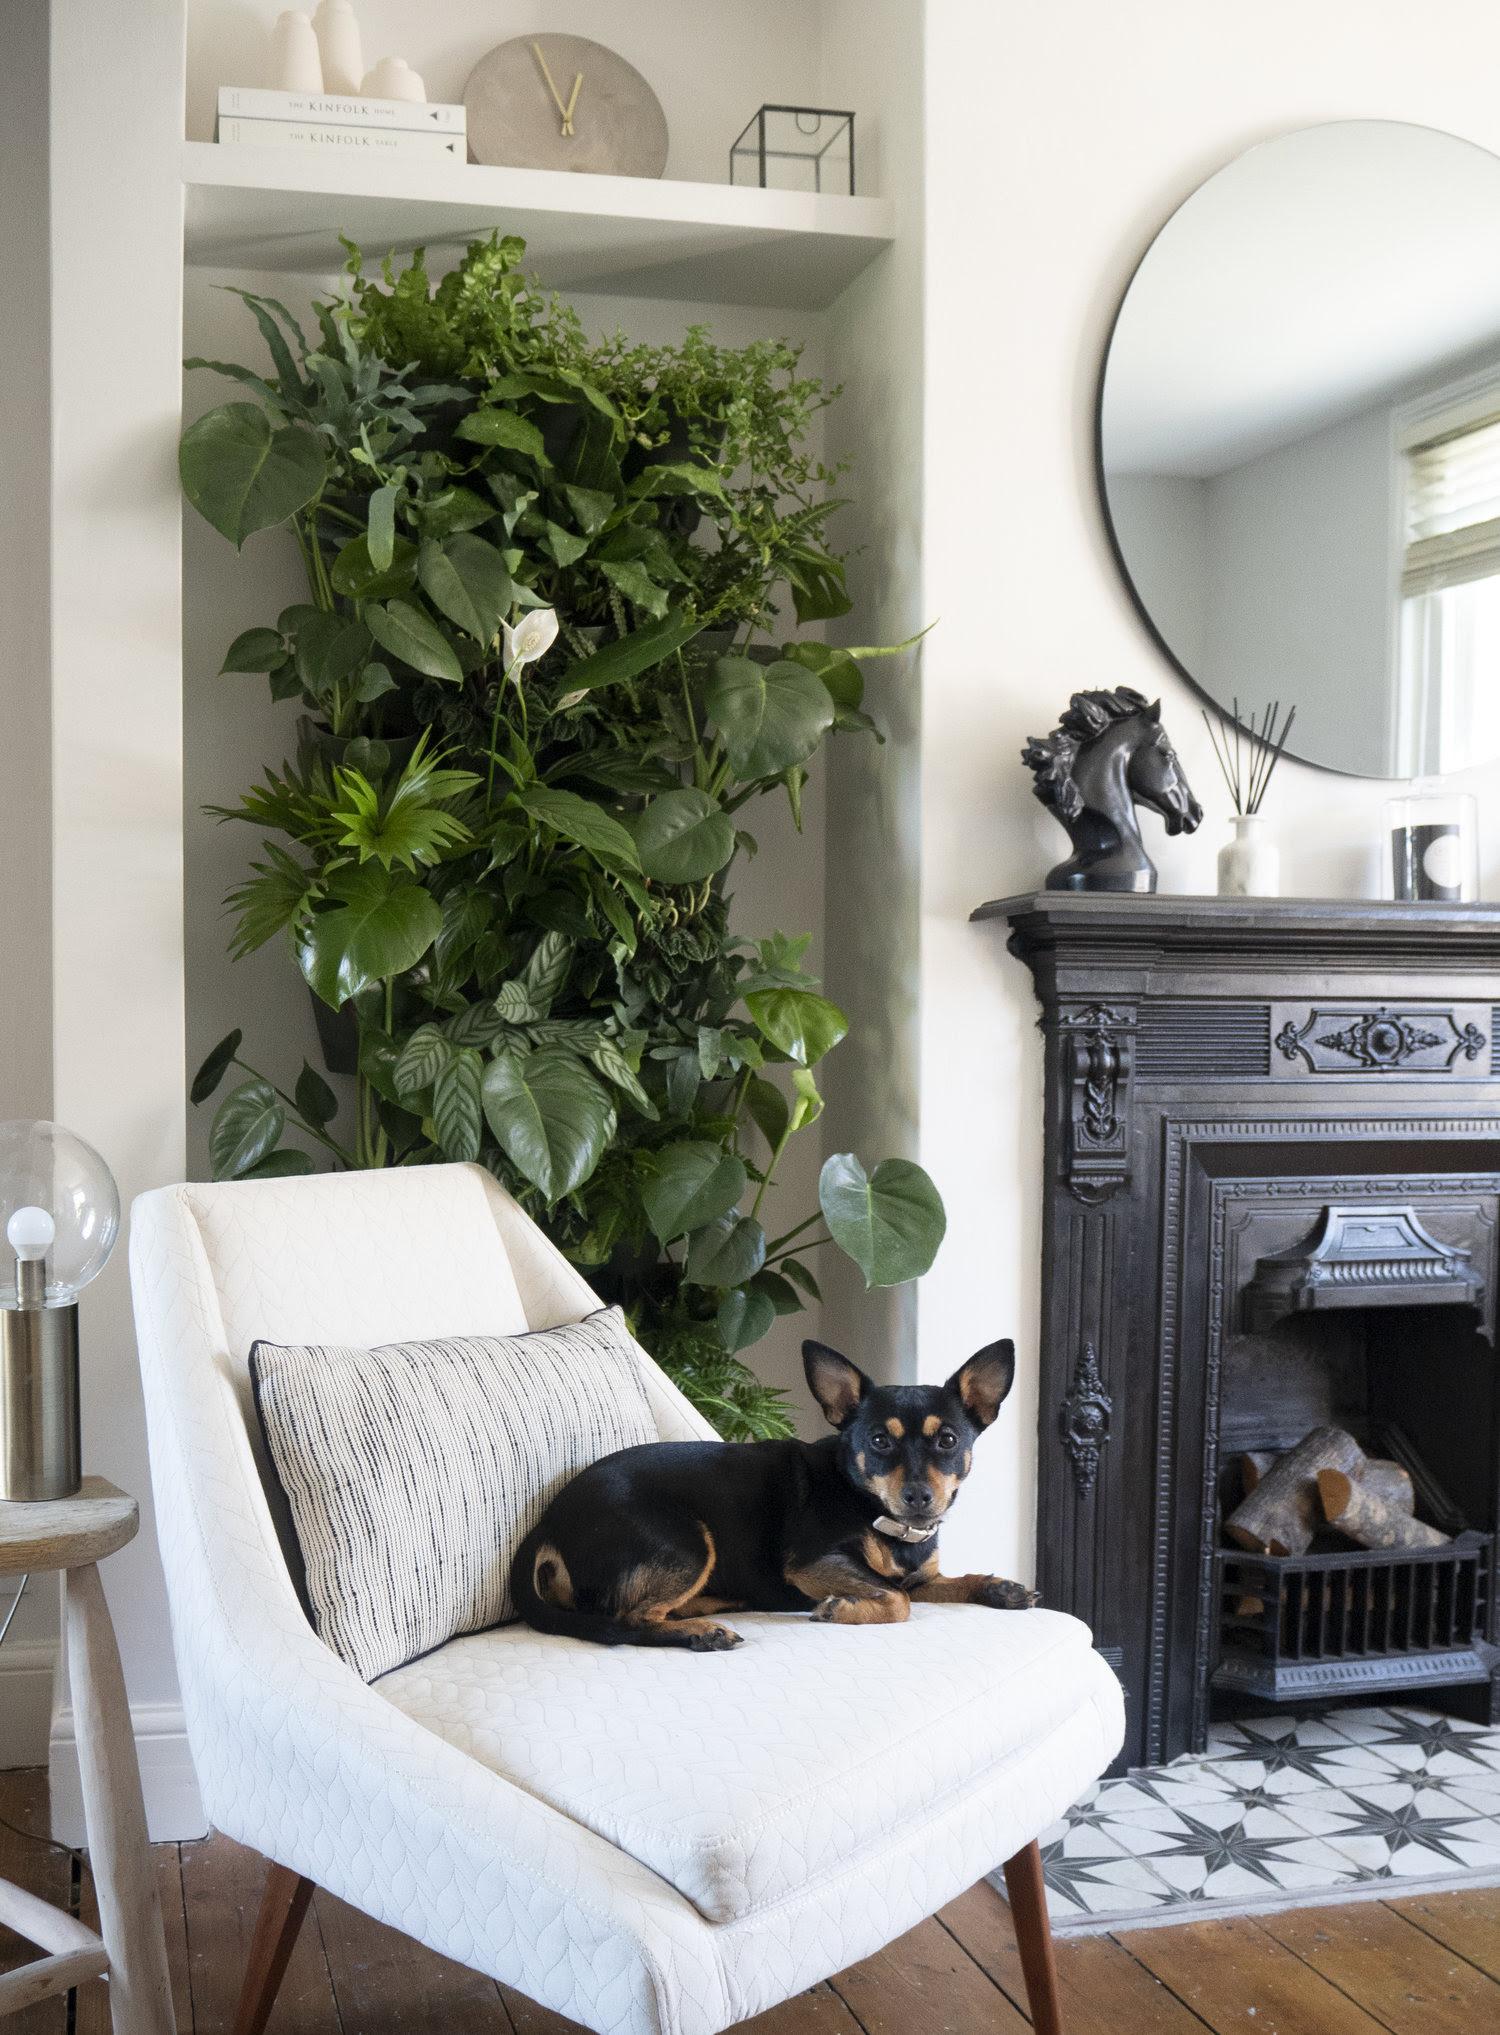 How I Built An Indoor Living Plant Wall Luke Arthur Wells